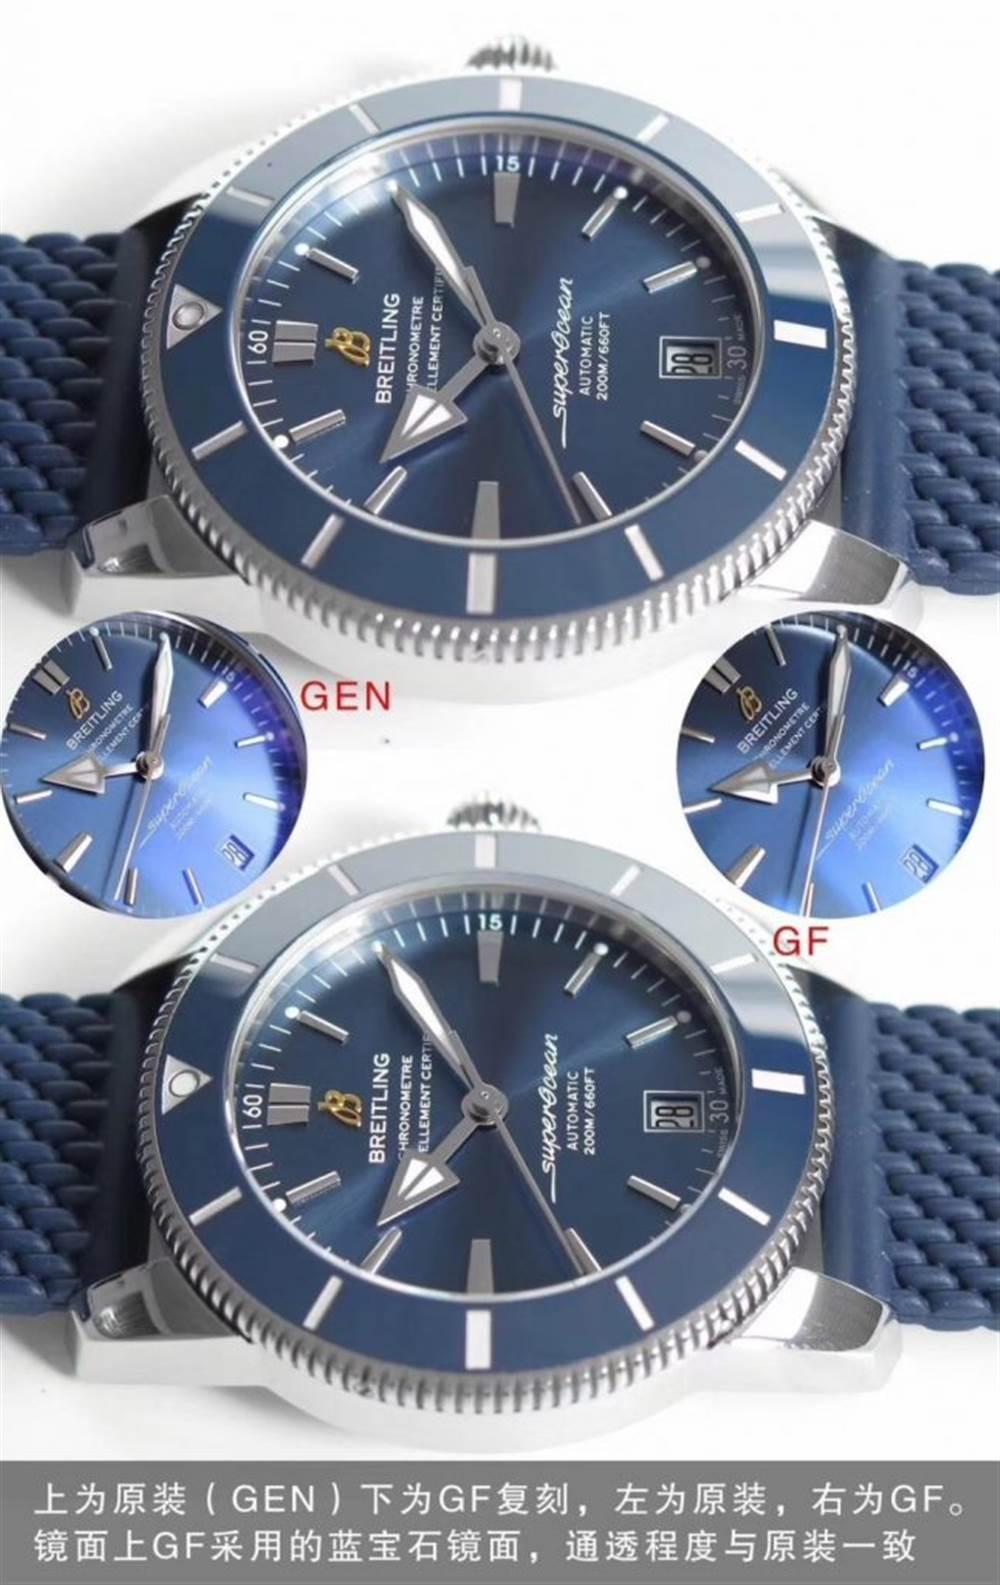 GF厂百年灵超级海洋系列AB2020161C1S1腕表对比评测 第3张